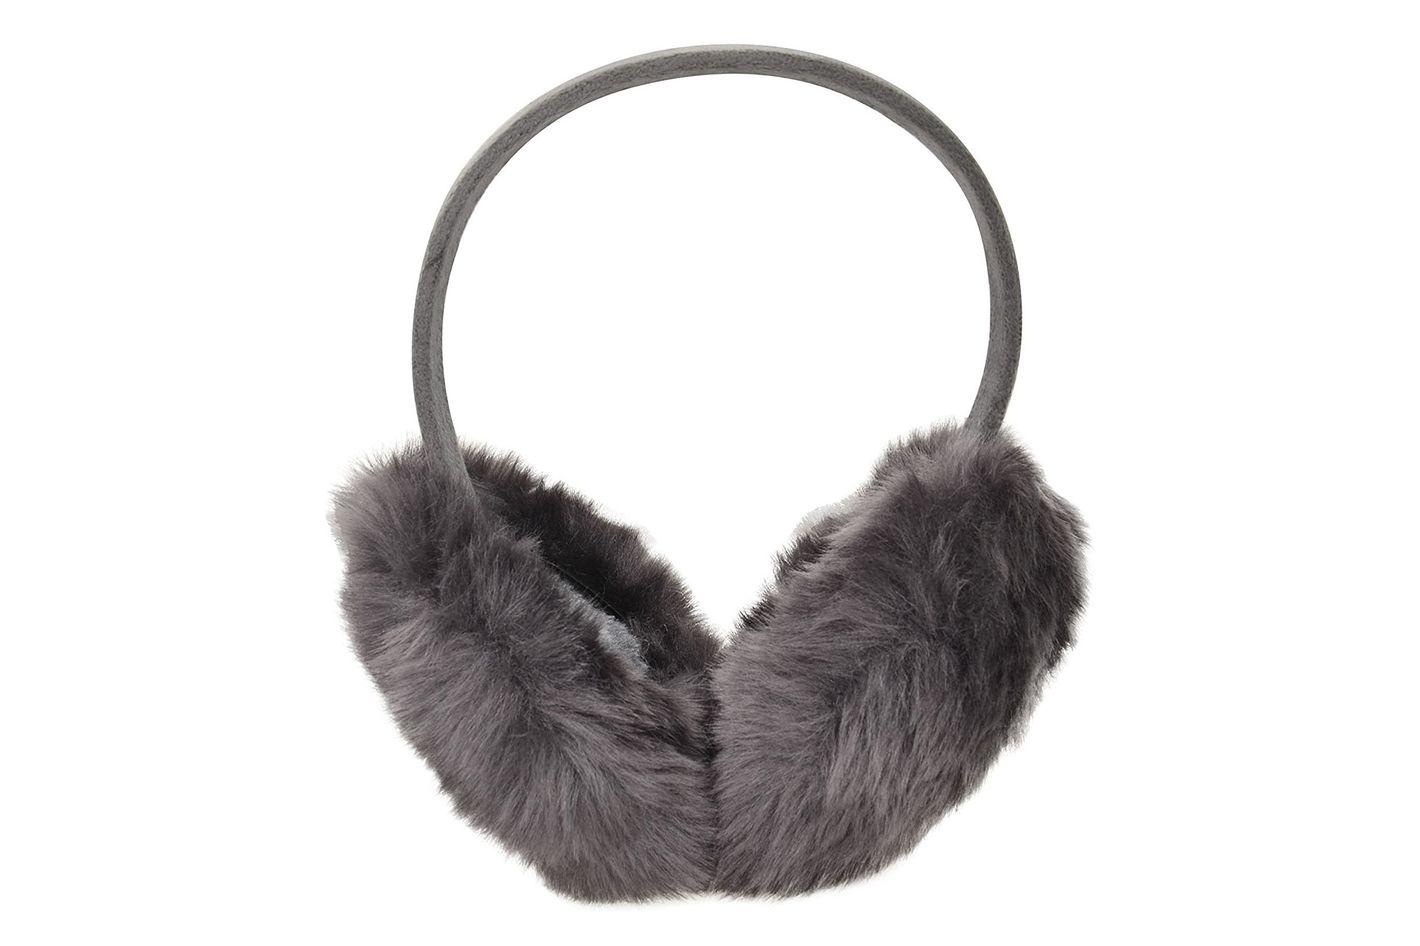 Simplicity Unisex Outdoor Earmuffs